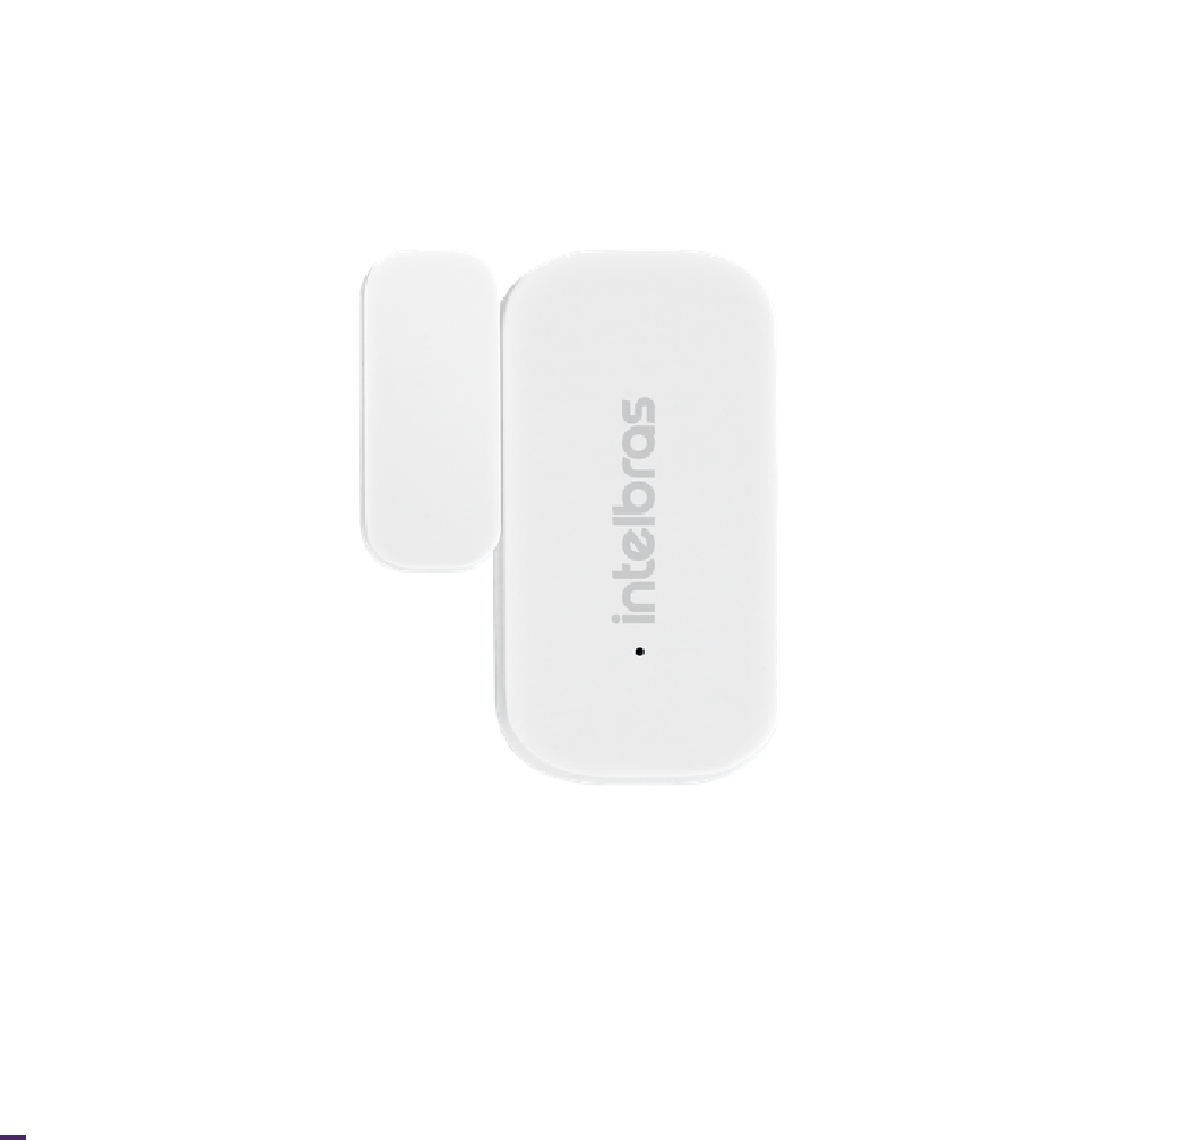 Sensor De Abertura Asa 3001 Intelbras